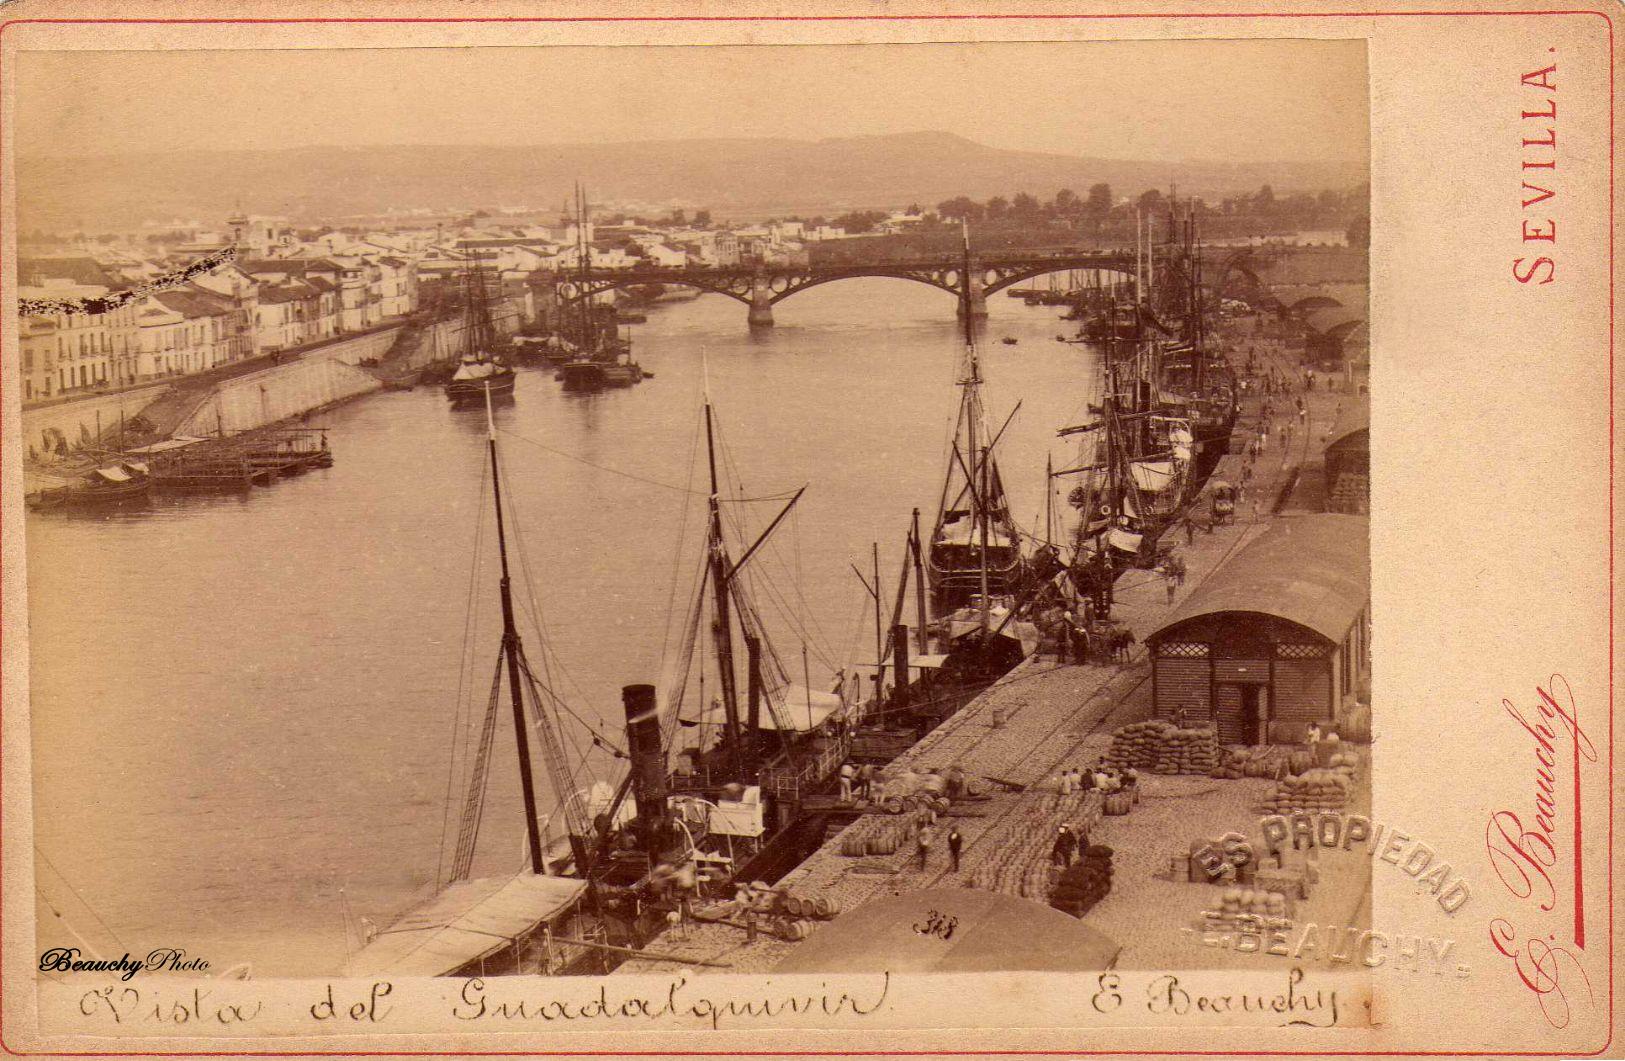 Beauchyphoto_Vista_del_Guadalquivir_Emilio_Beauchy_Cano_fotografias_antiguas_postales_vistas_y_monumentos